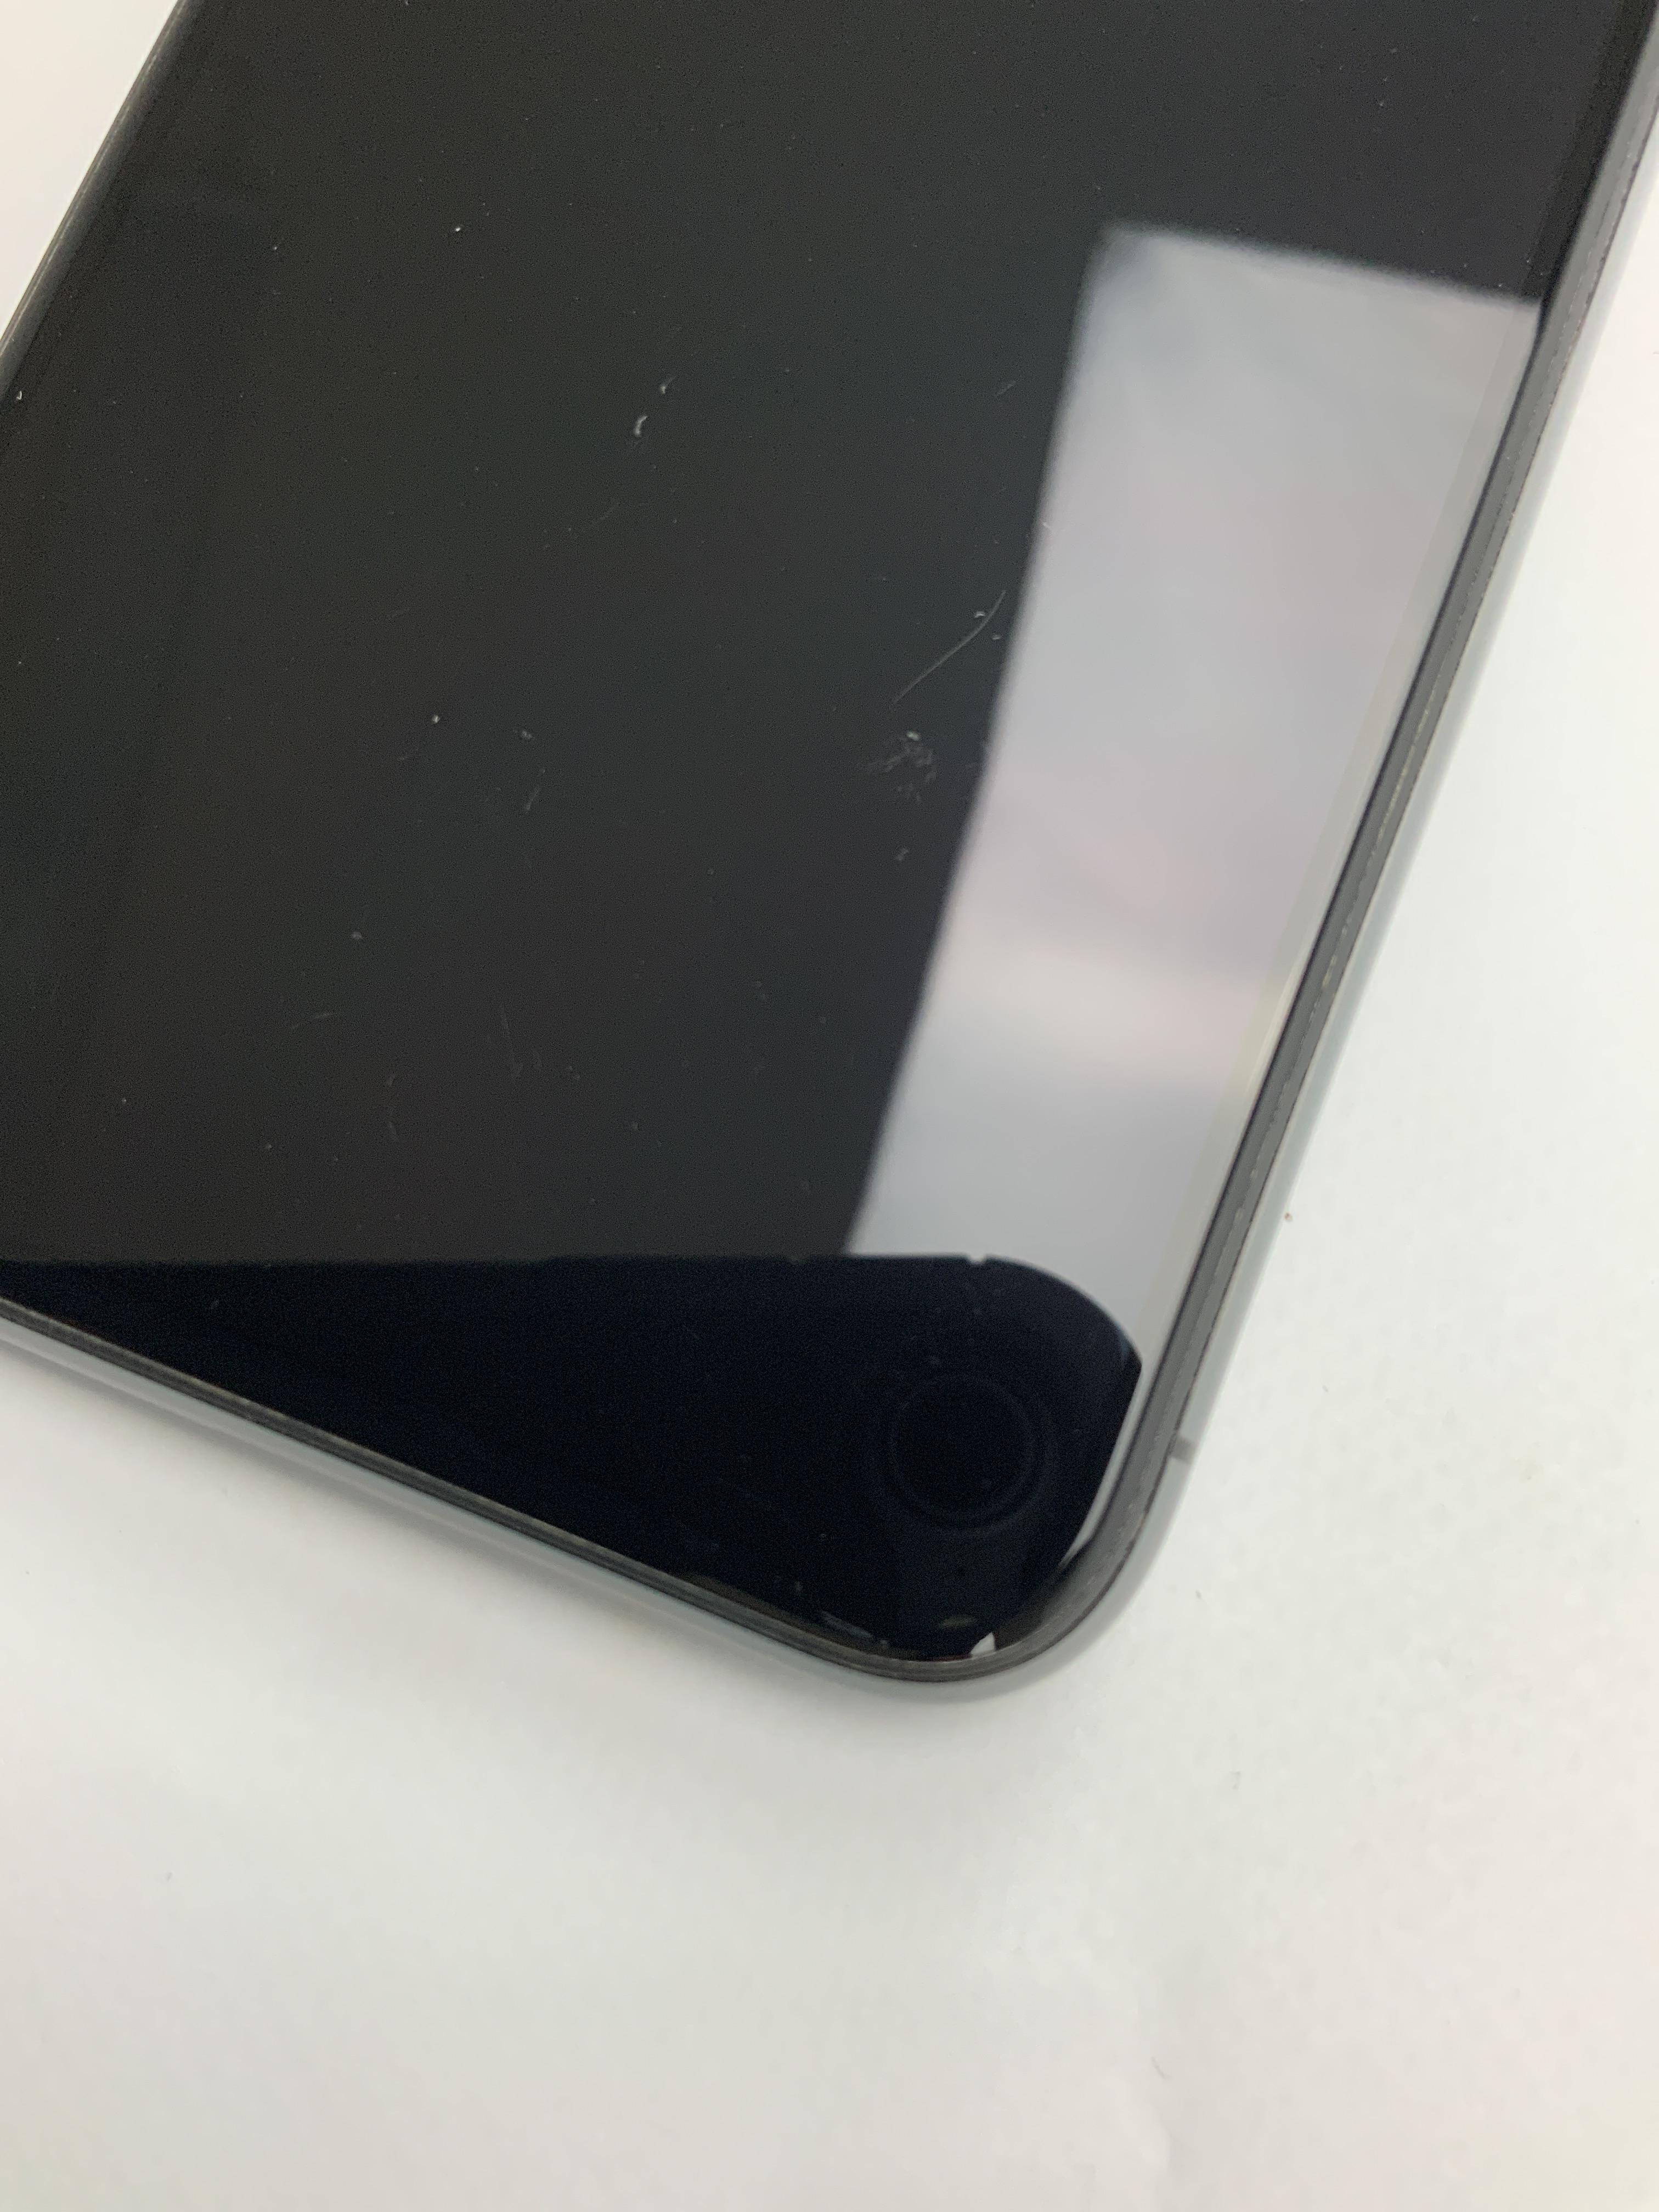 iPhone 11 Pro 64GB, 64GB, Space Gray, imagen 3